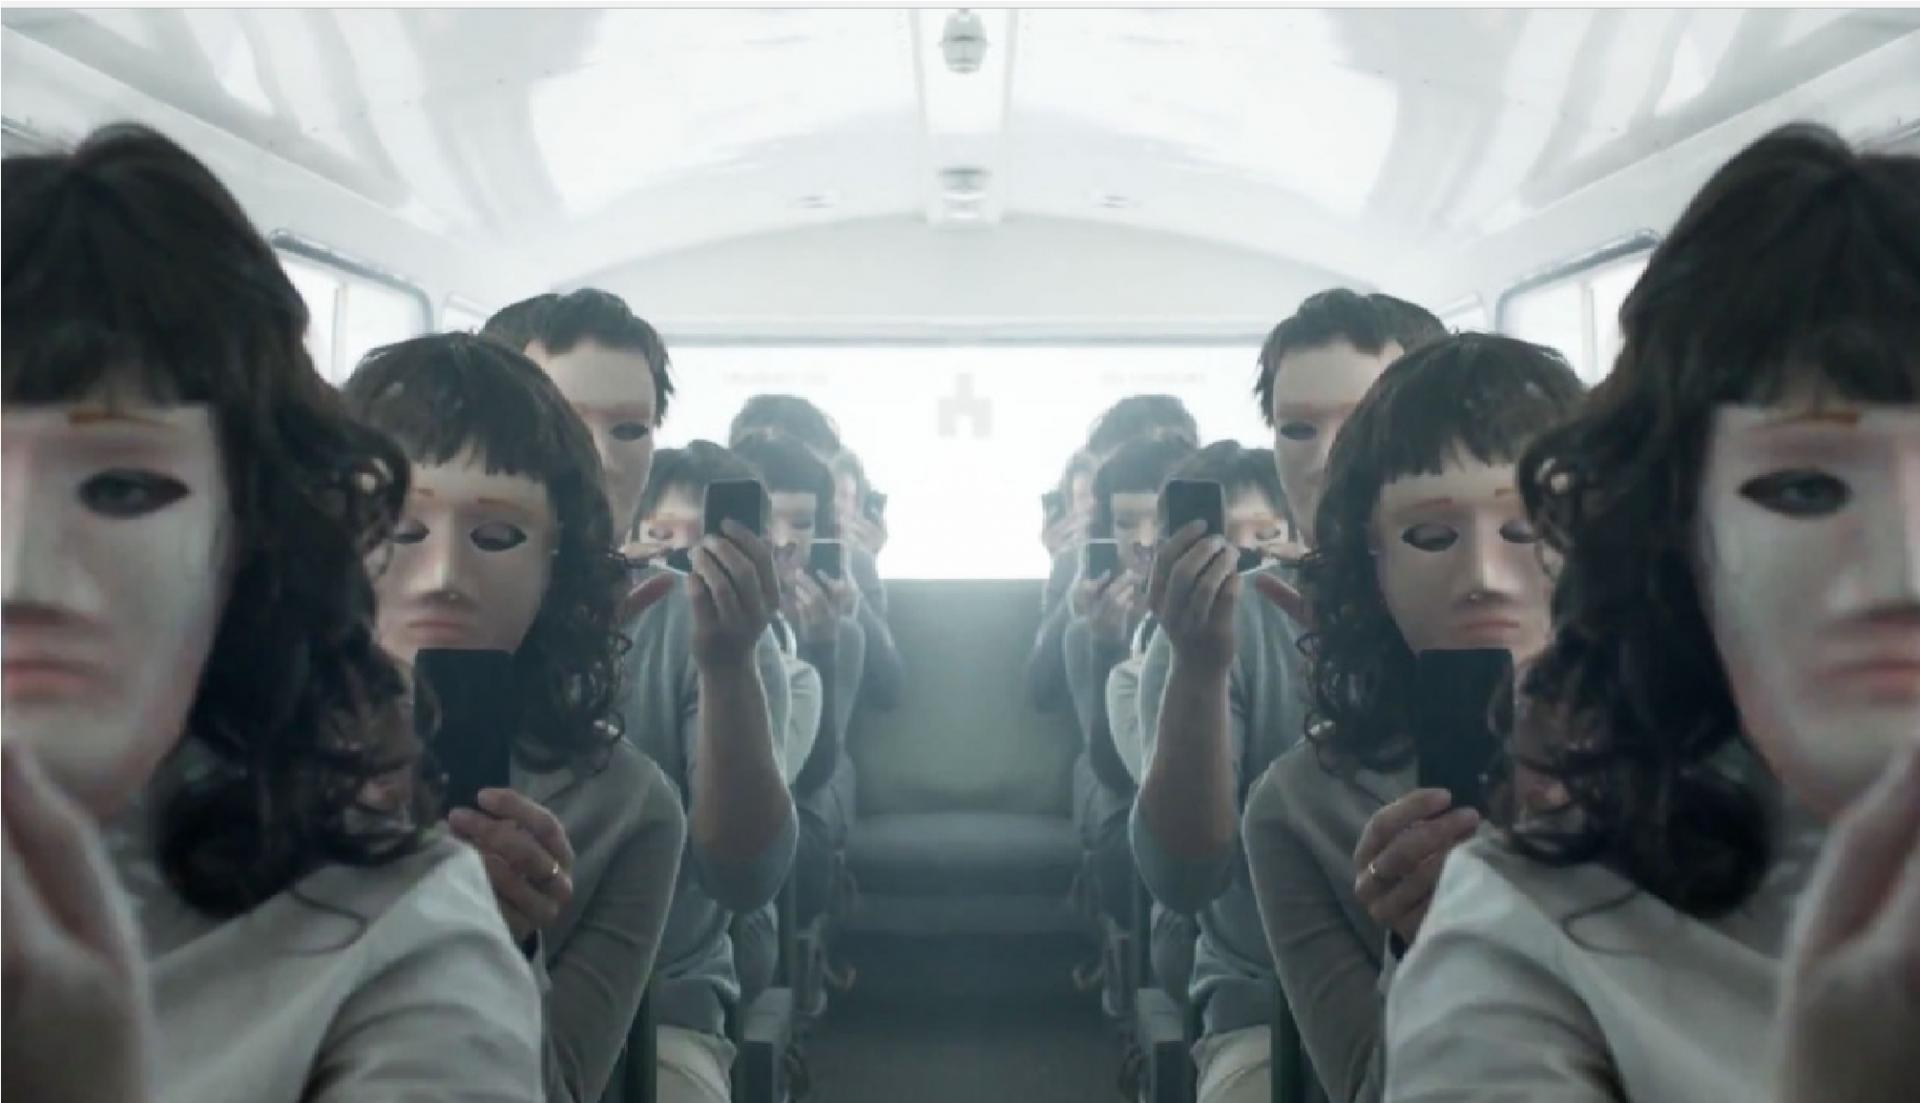 Image gallery for Black Mirror: White Bear (TV) - FilmAffinity